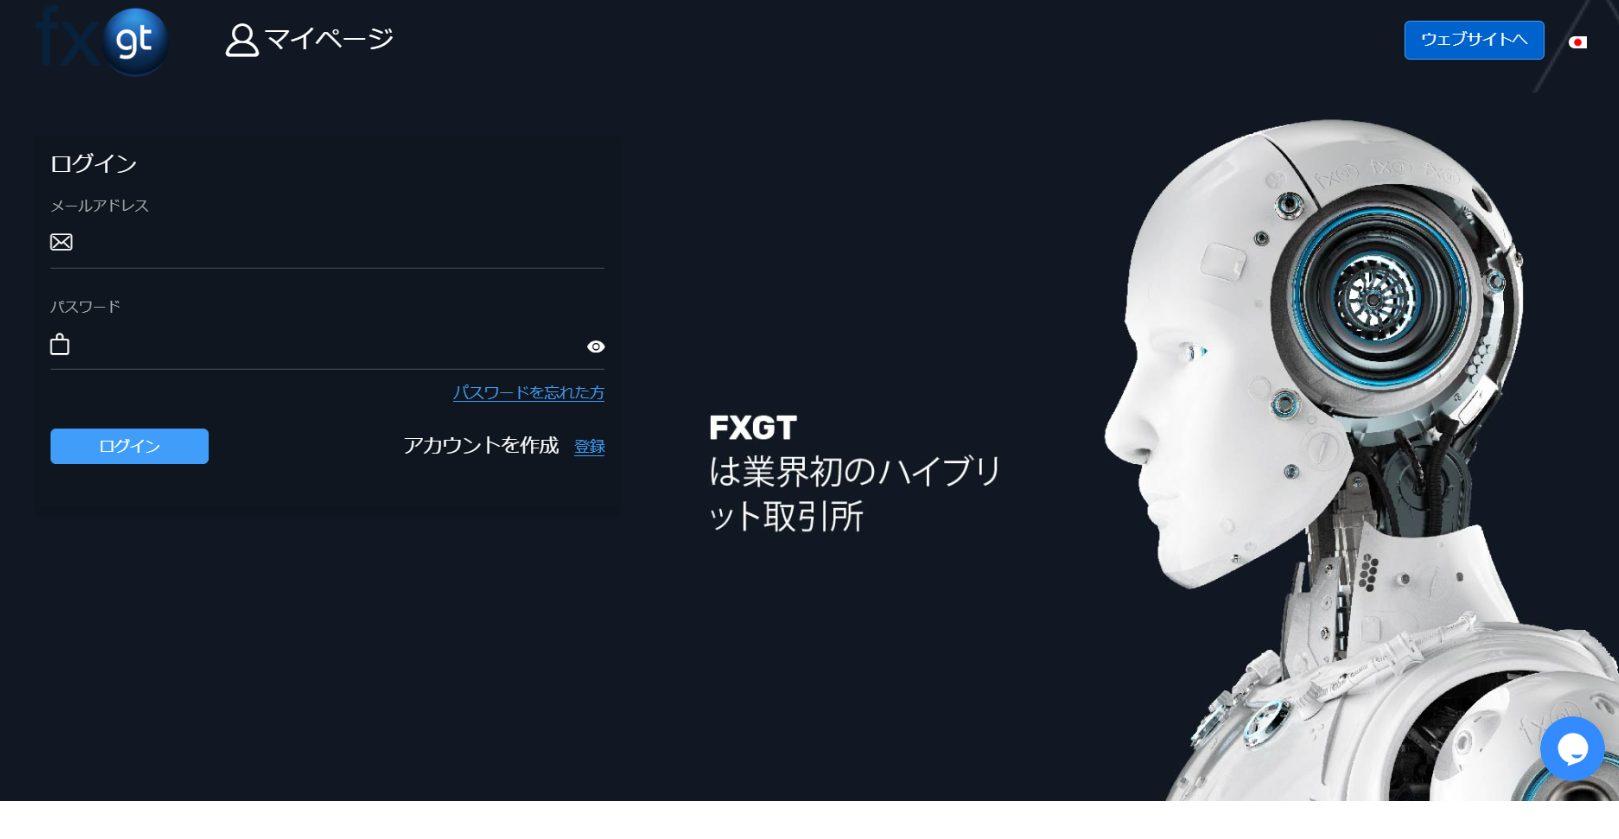 FXGTメール認証後ログイン画面